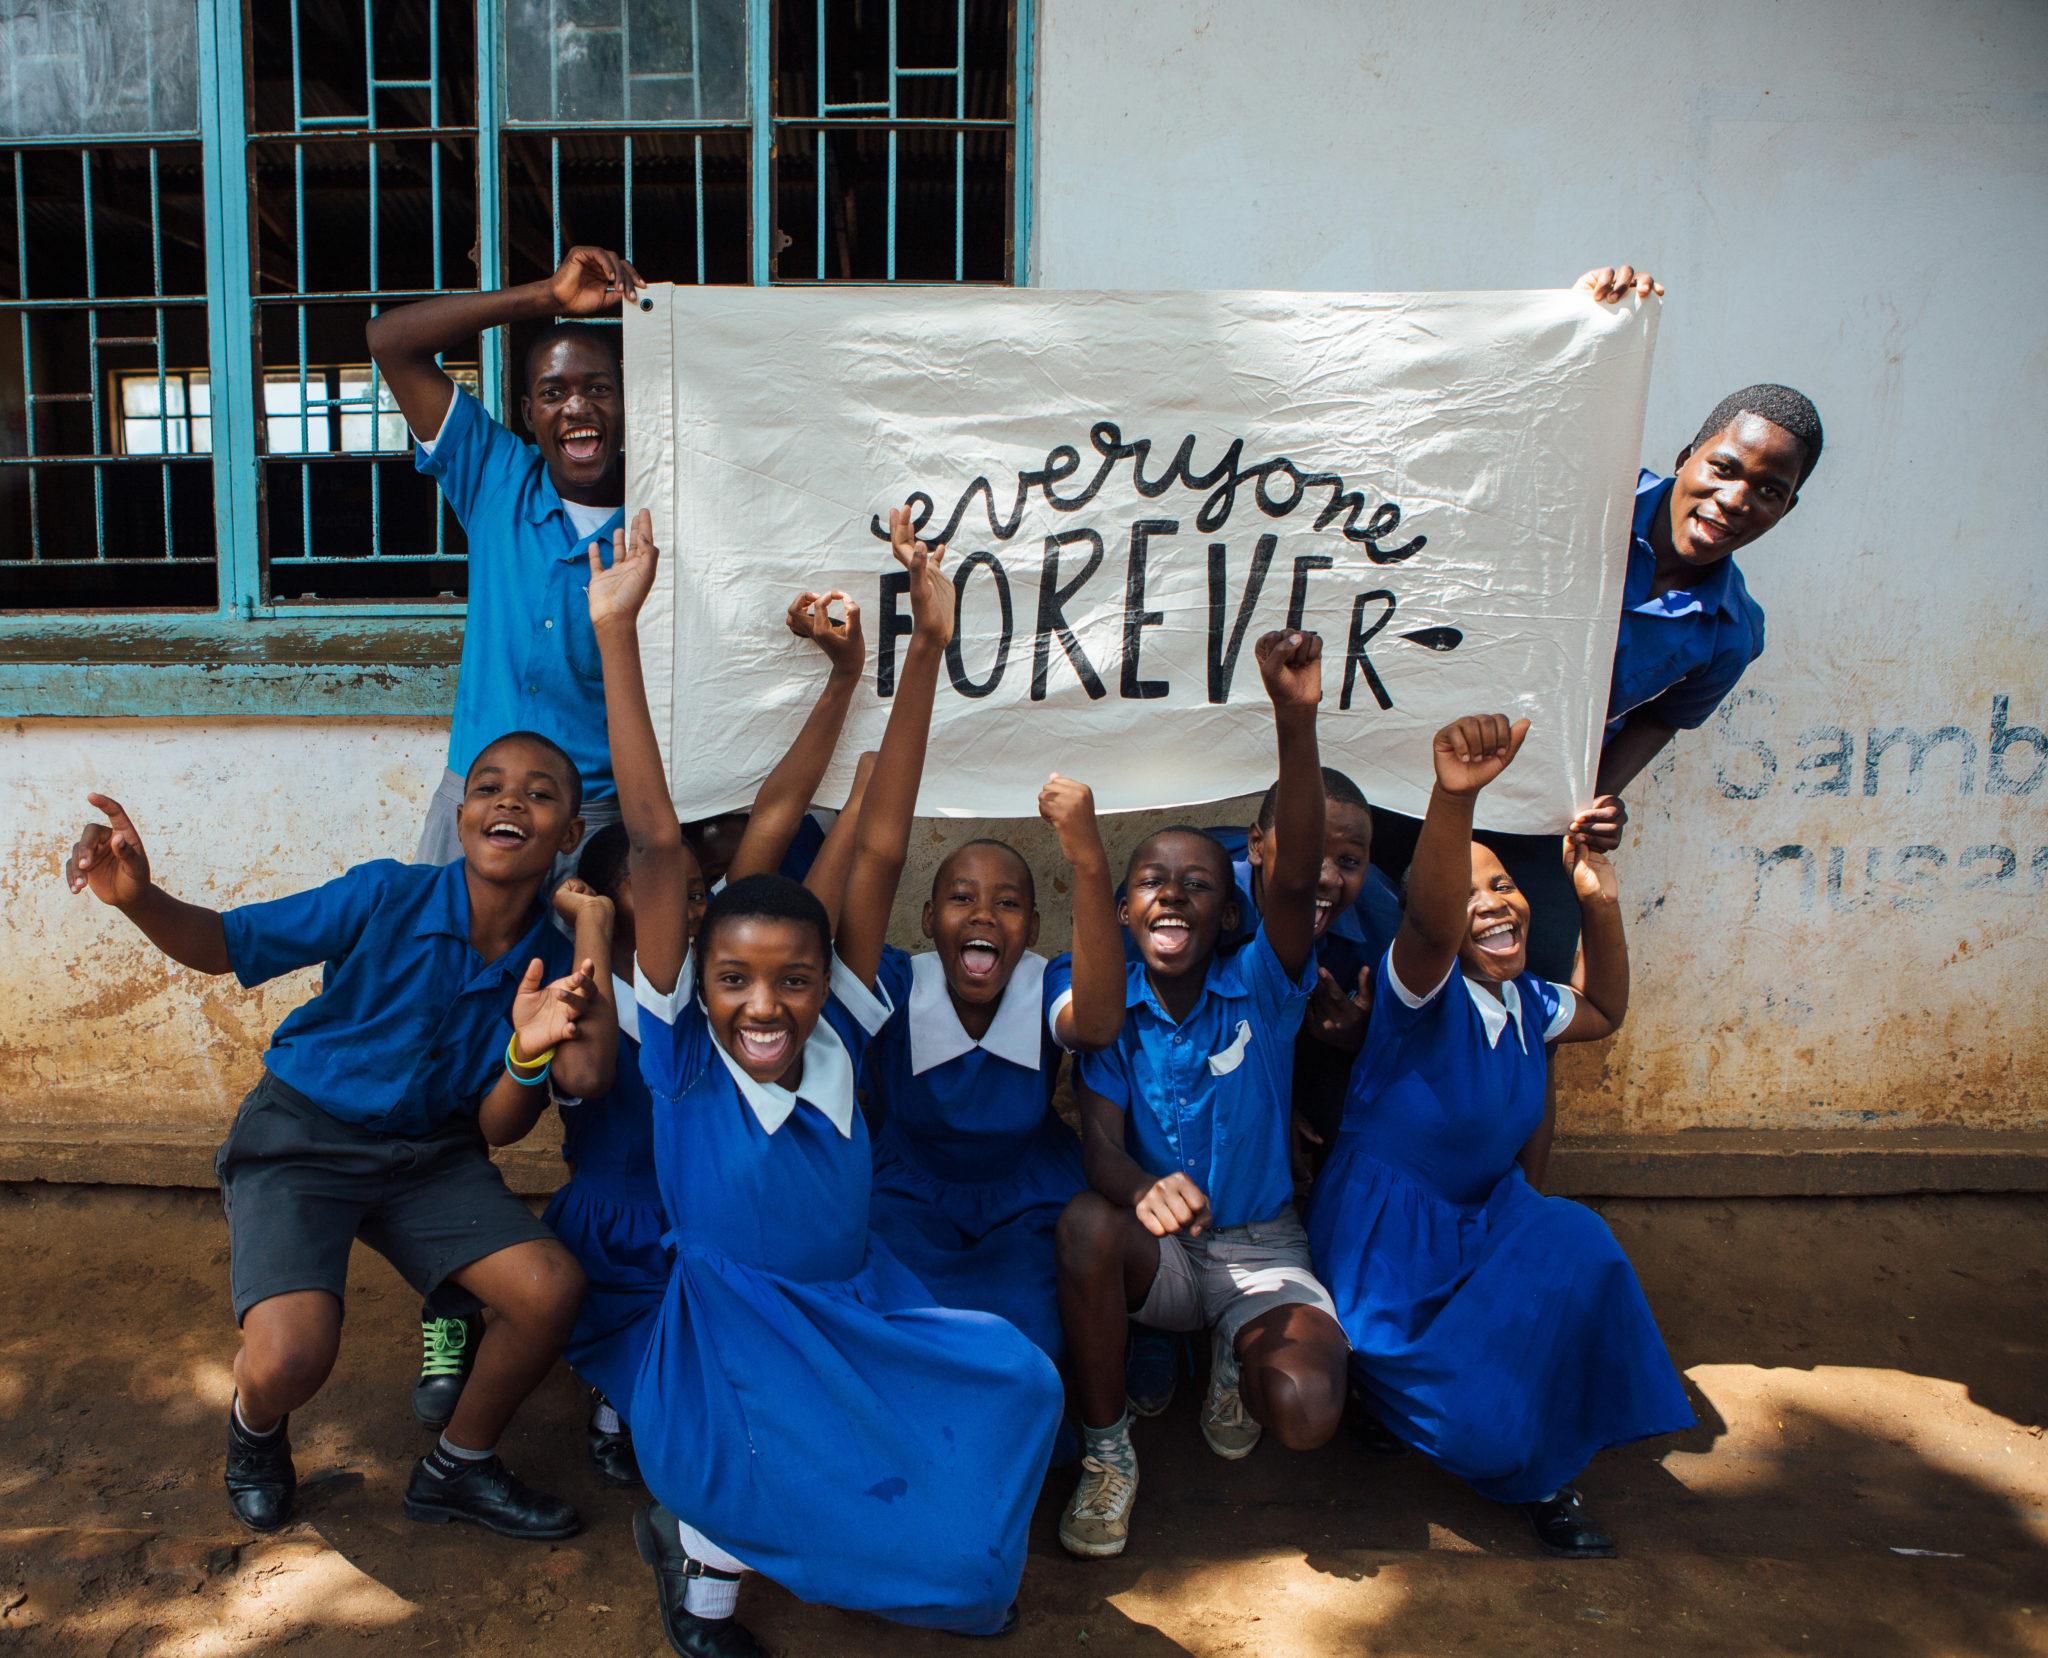 Malawi_Blantyre_2016_Chilomoni_LEA_School_ChilomoniLEASchool-(26)5